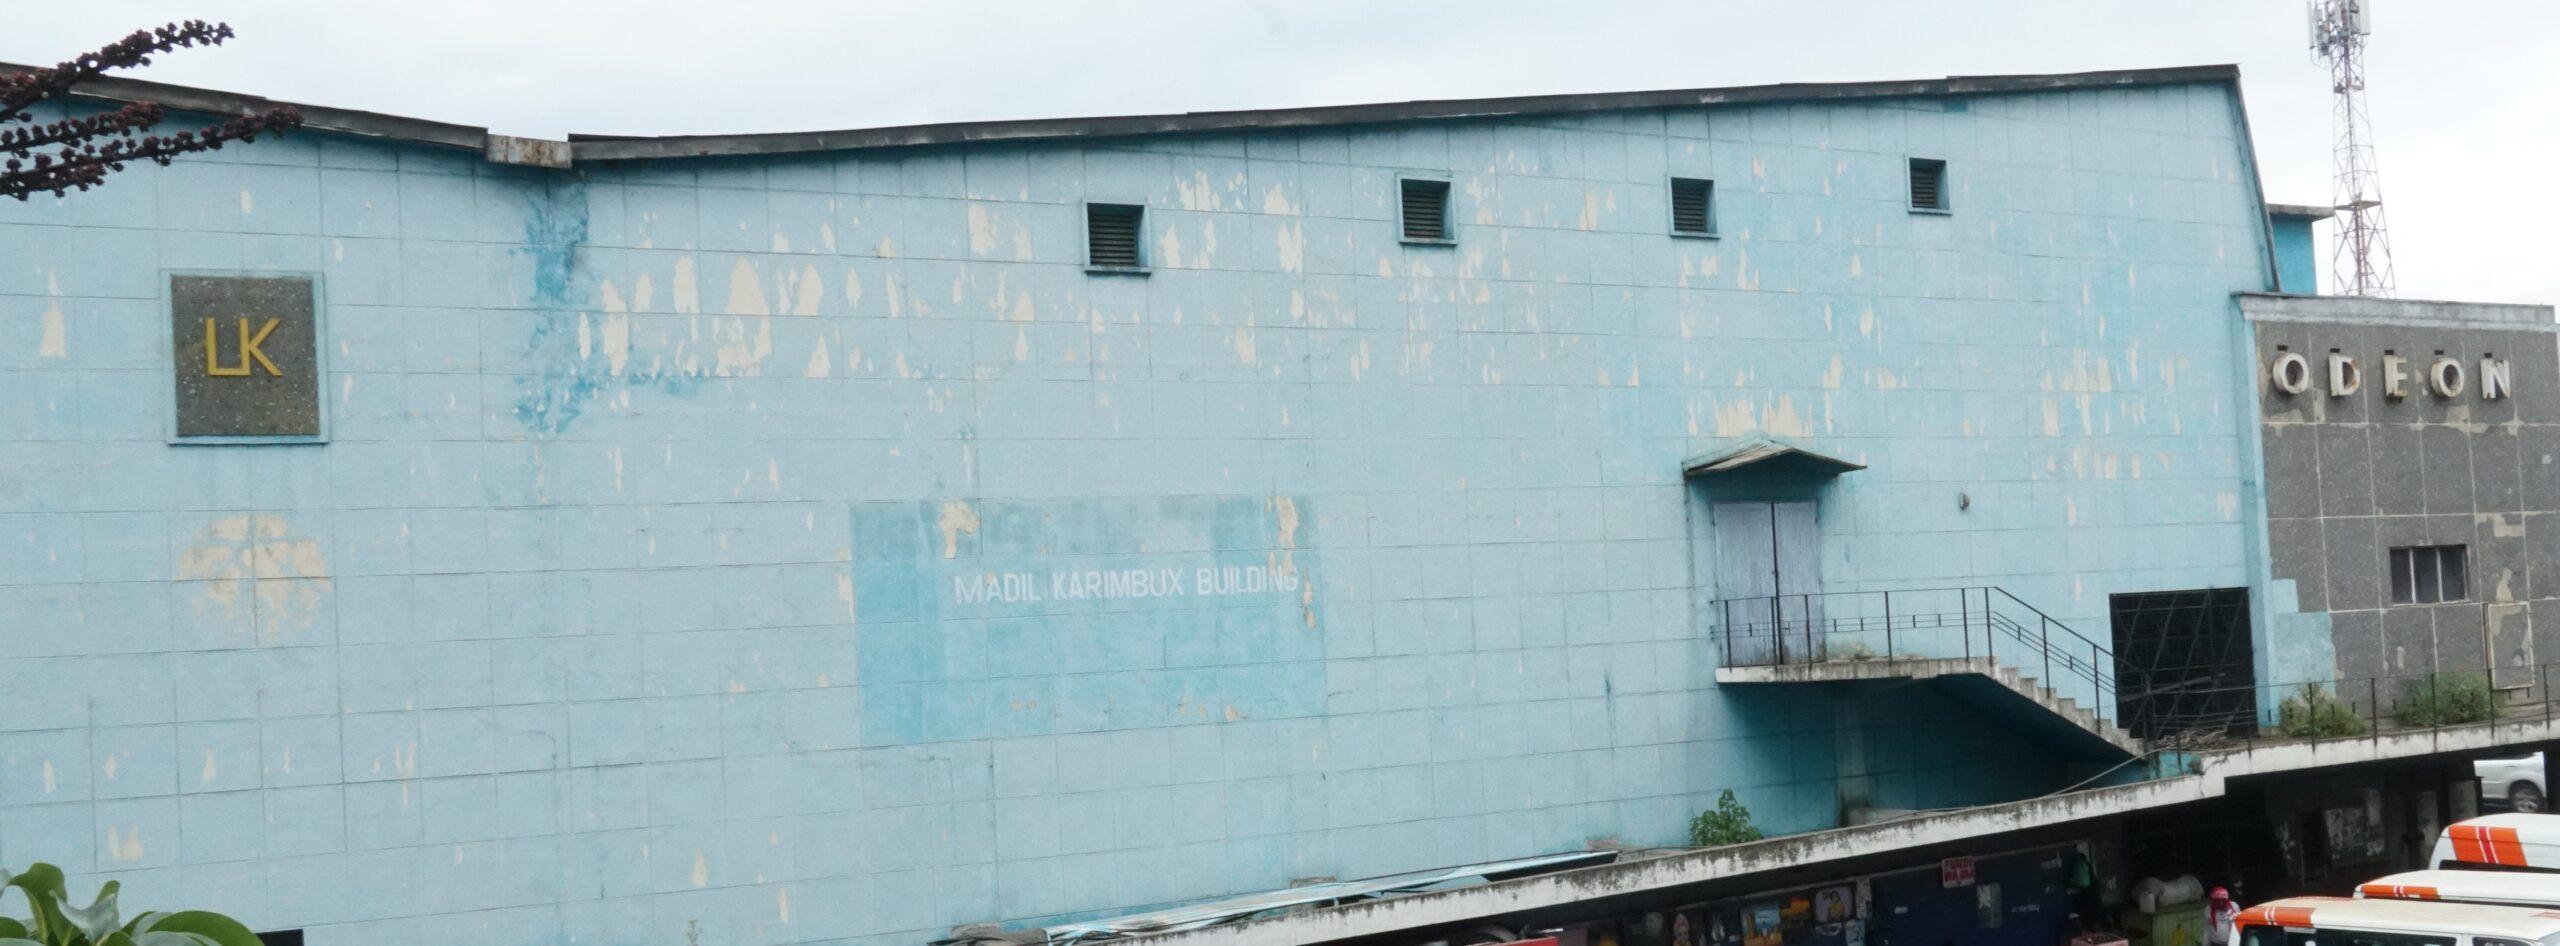 Odeon Cinema Nakuru